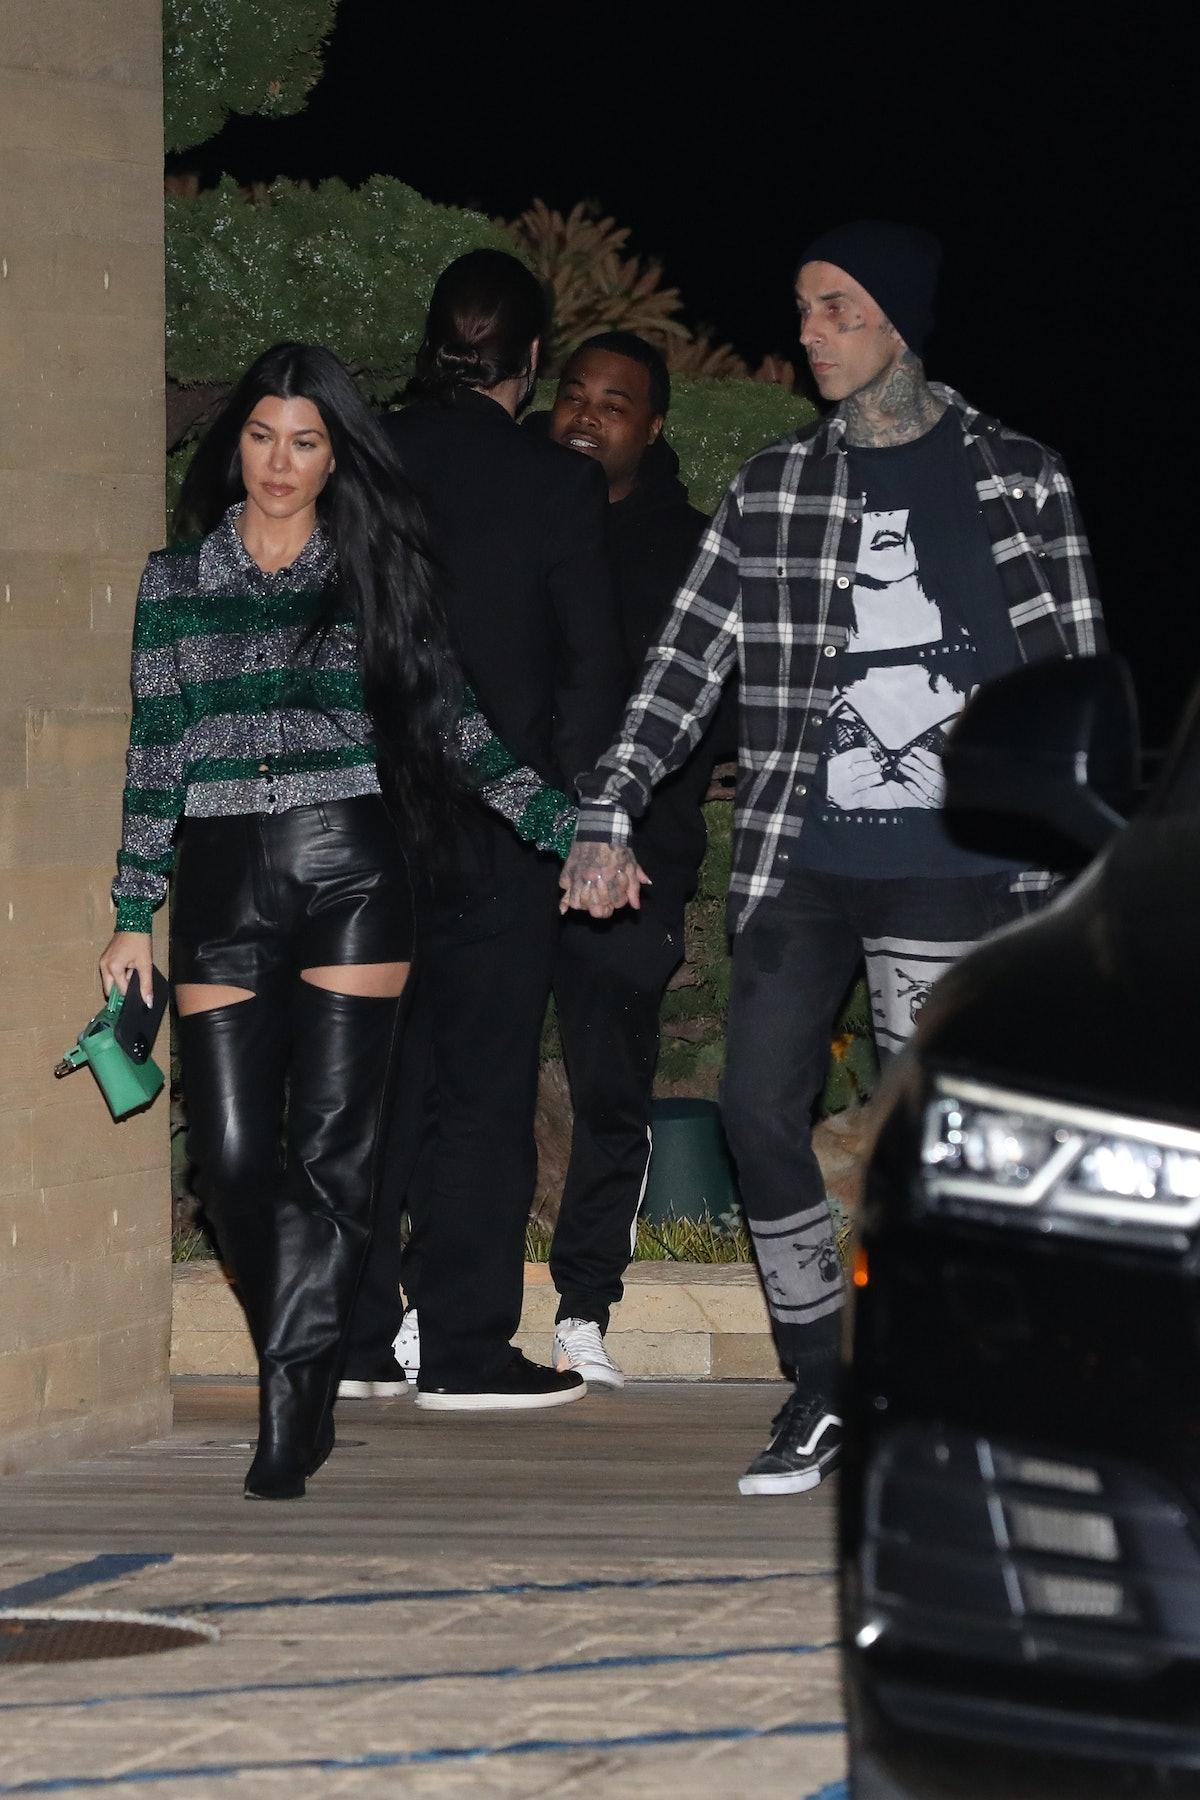 MALIBU, CA - MARCH 20: Kourtney Kardashian and Travis Barker are seen at Nobu restaurant on March 20...